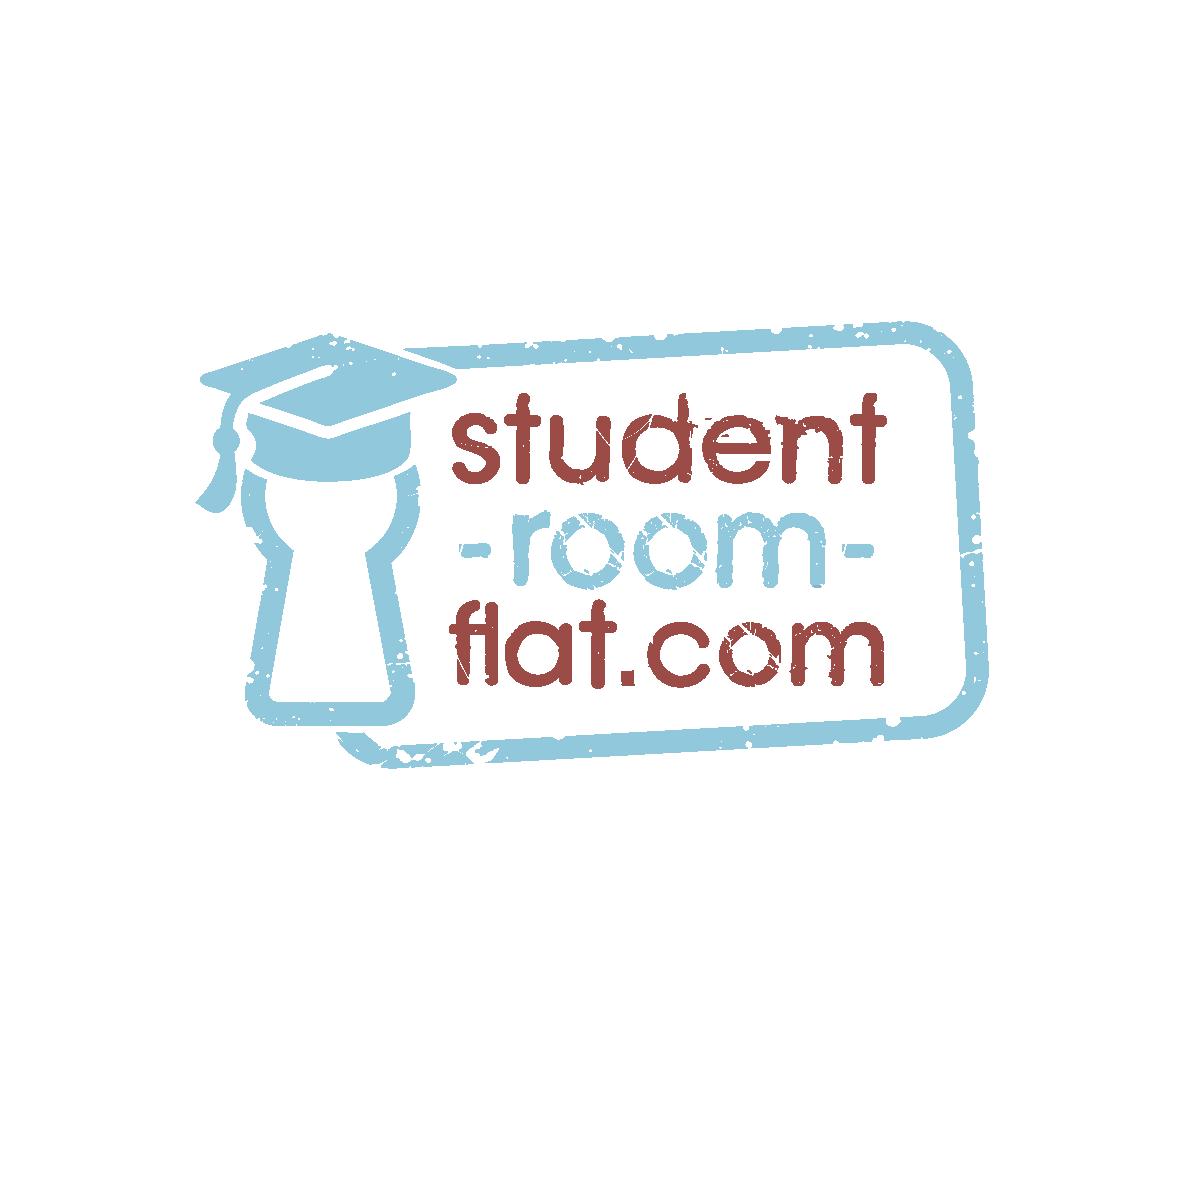 Student Room Flat